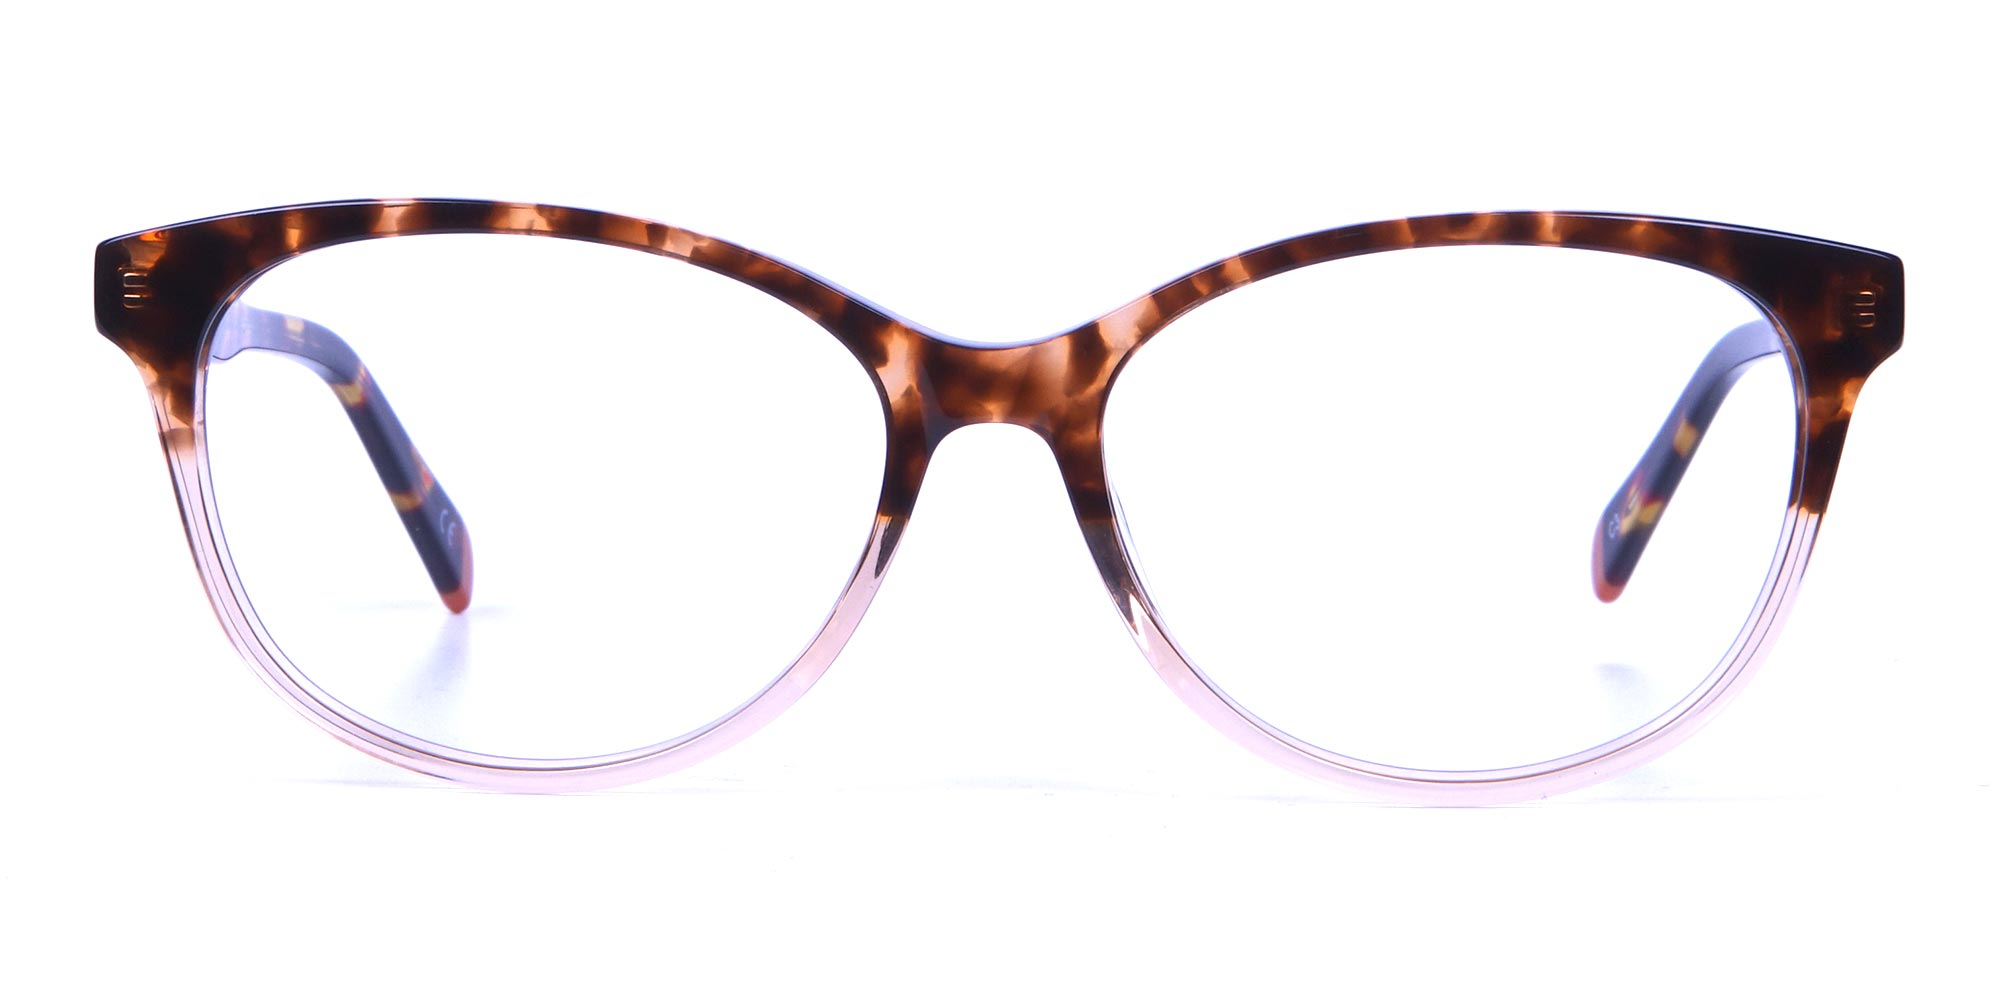 Specscart Cat Eye Frames